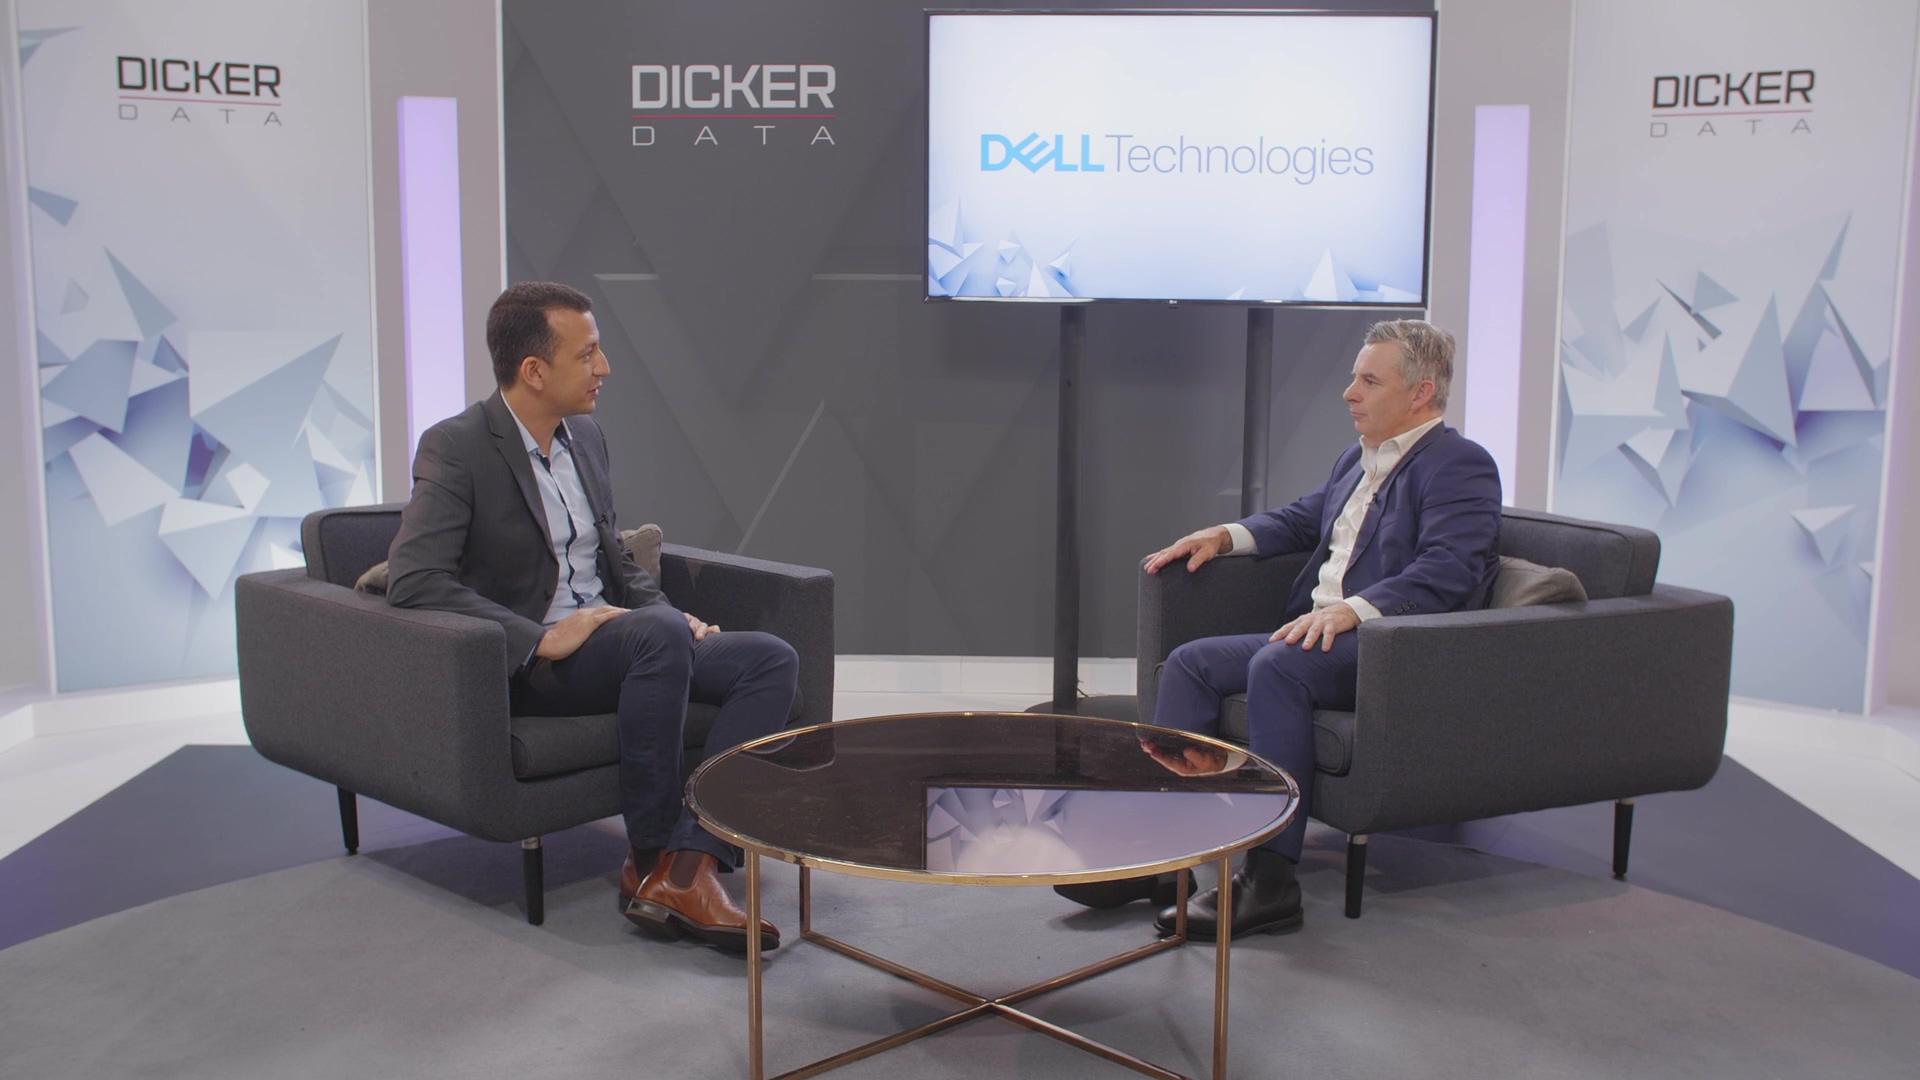 Dell Technologies MSP Distributor | Dicker Data